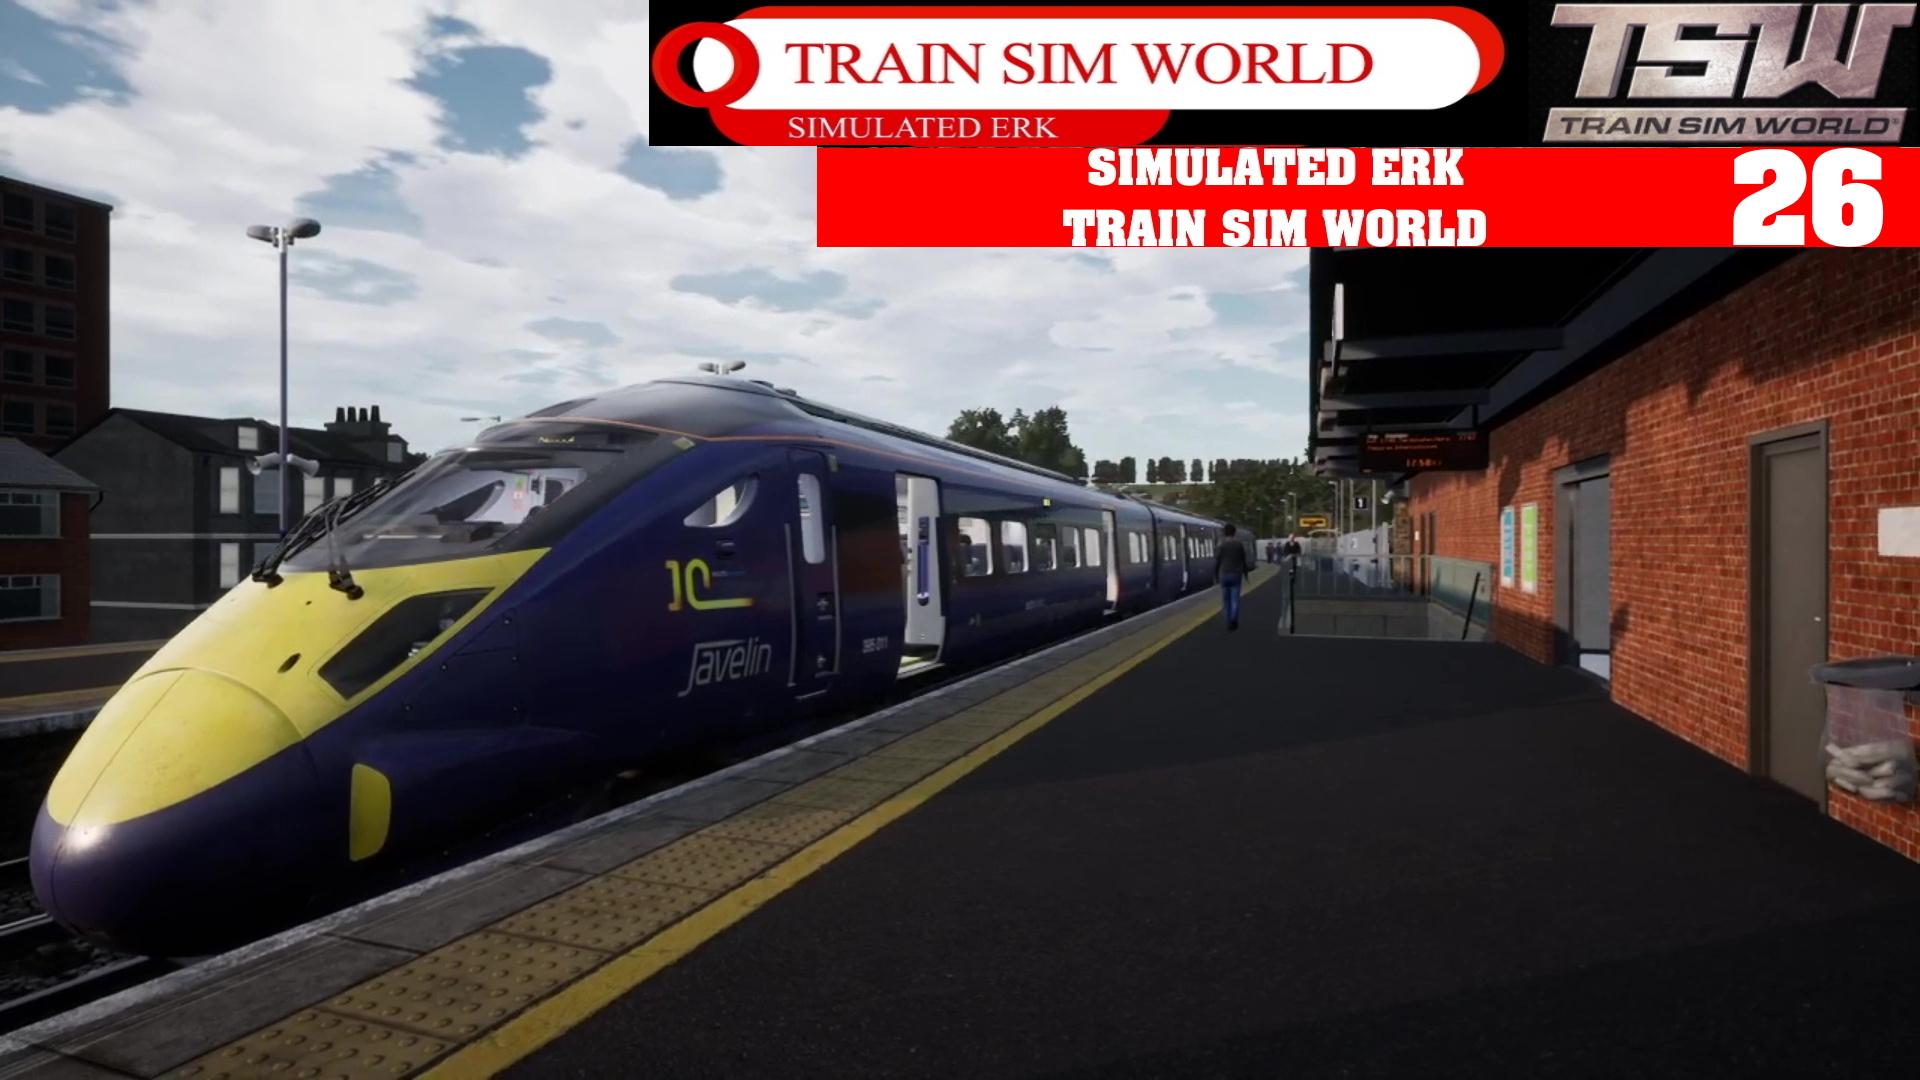 Simulated Erk: Train Sim World episode 26 | Bank Holiday Tunnel Of Doom